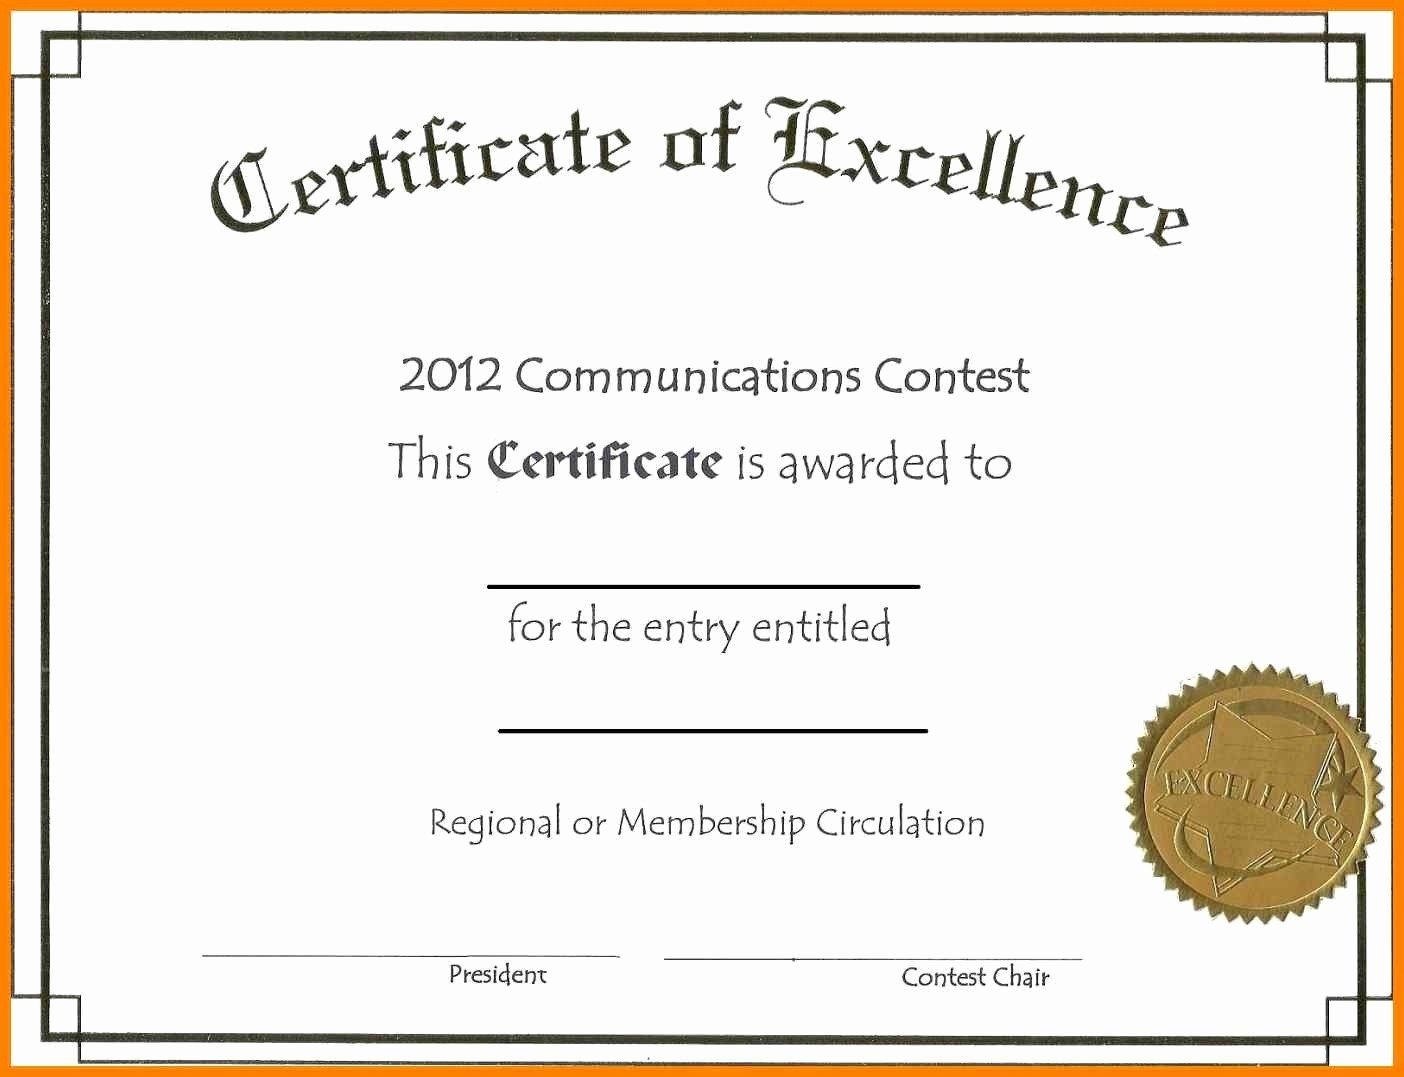 Open Office Certificate Templates Free Luxury Open Fice Certificate Templates Free Back to Post Cv